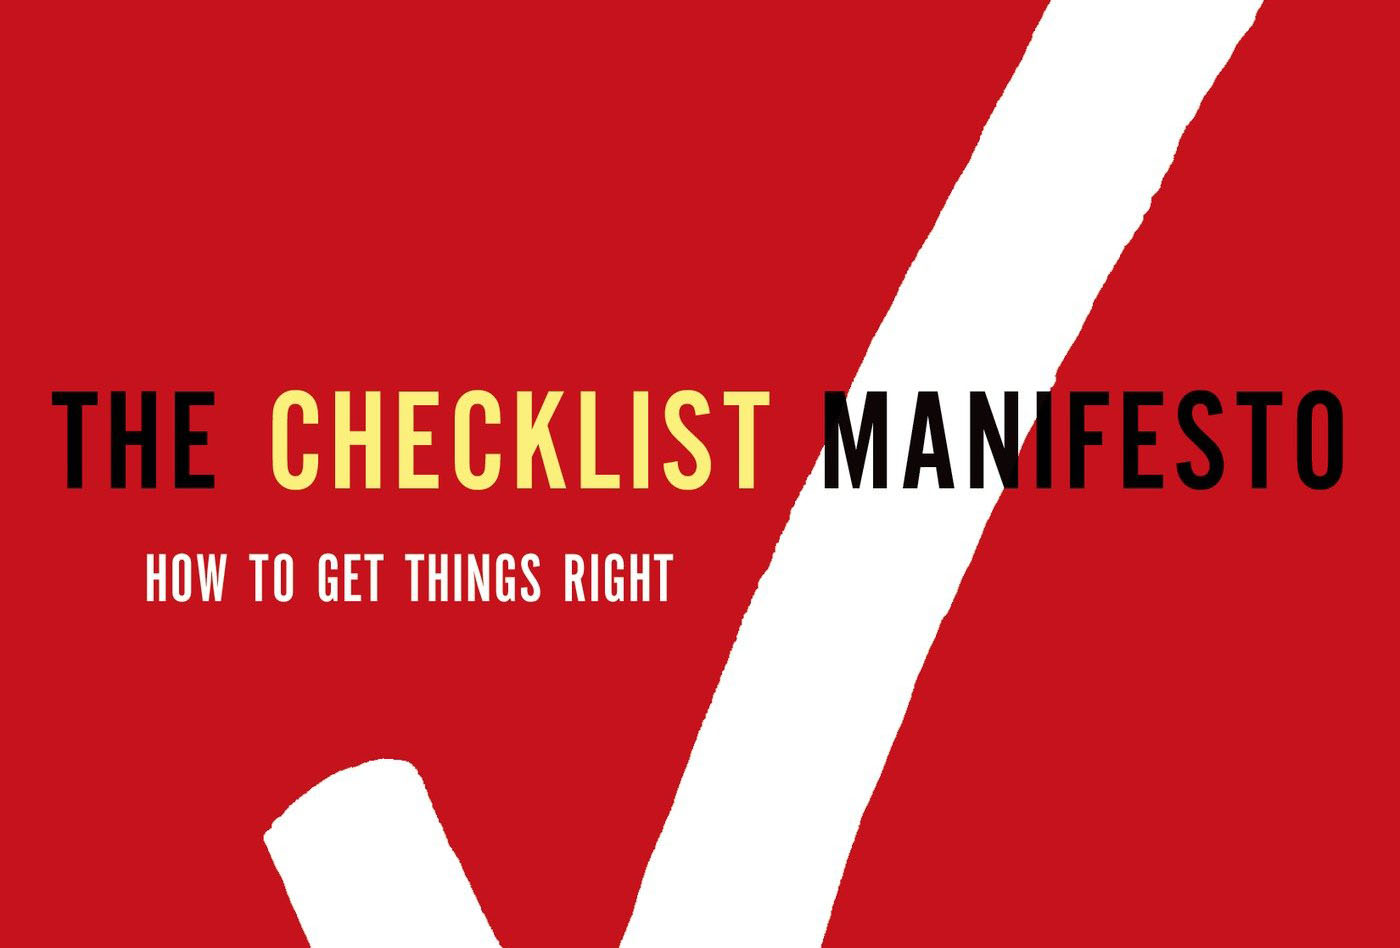 Checklist-Manifesto-FI.jpg